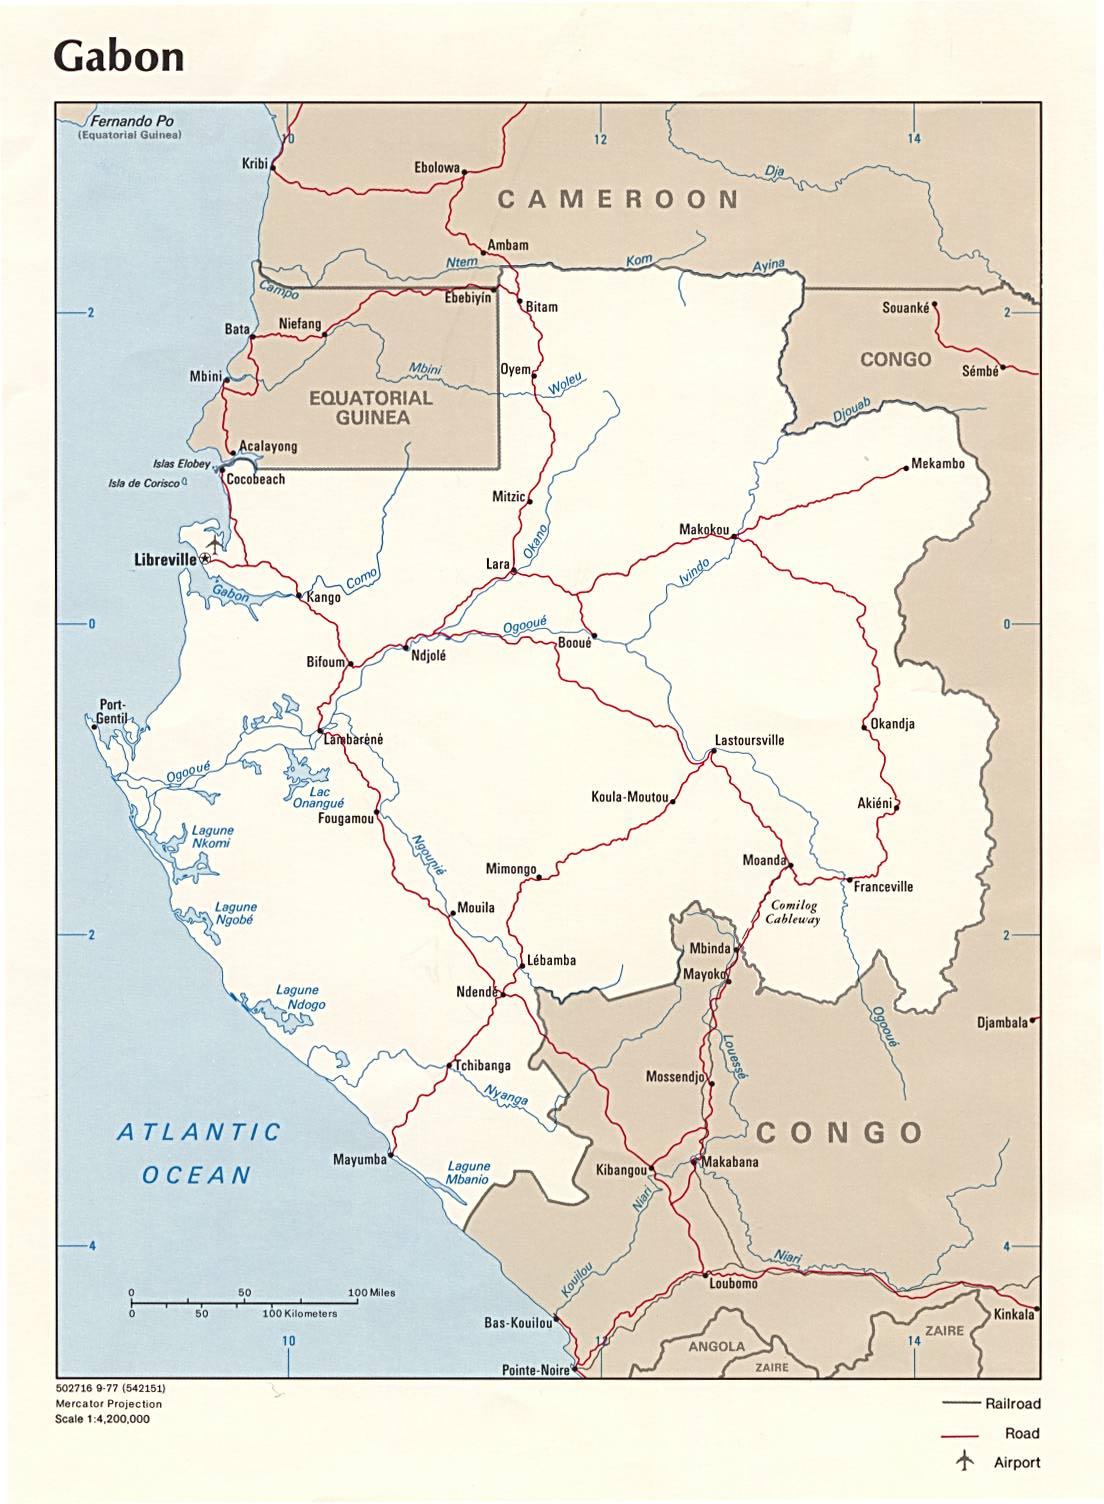 Ŝ�图 Ŋ�蓬地图 Gabon ɝ�洲地图 Afica Maps Ǿ�景旅游网